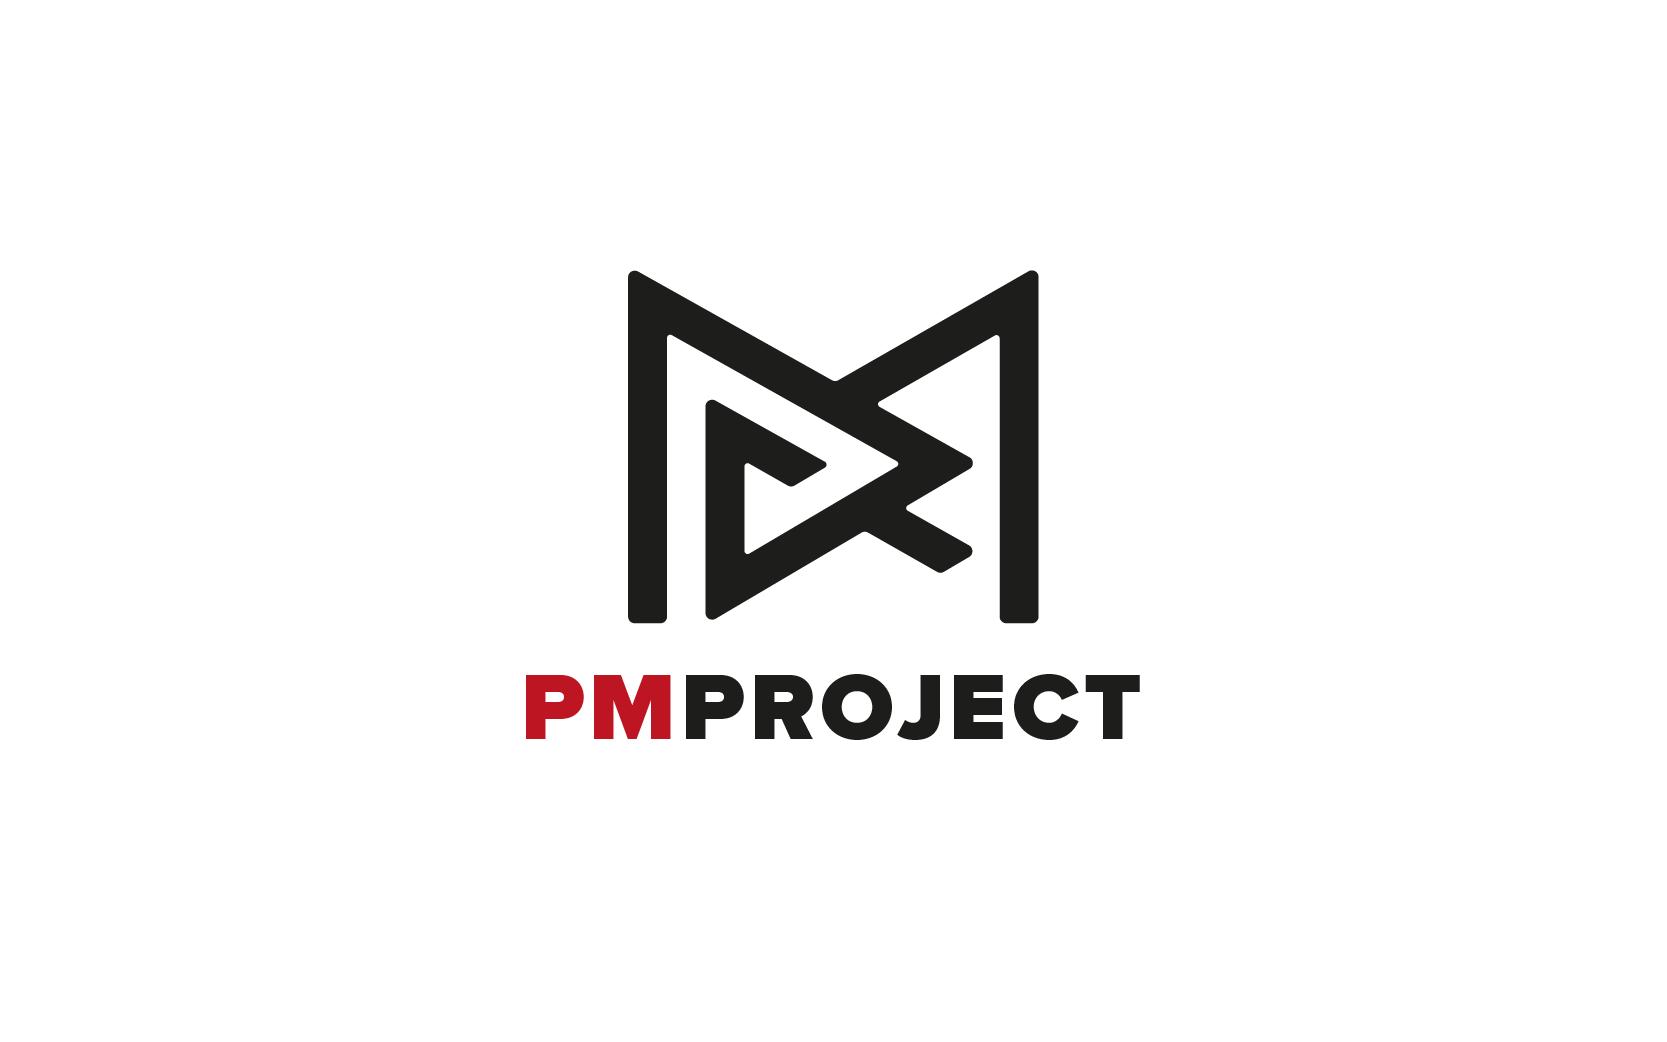 j+design-logo-design-pm